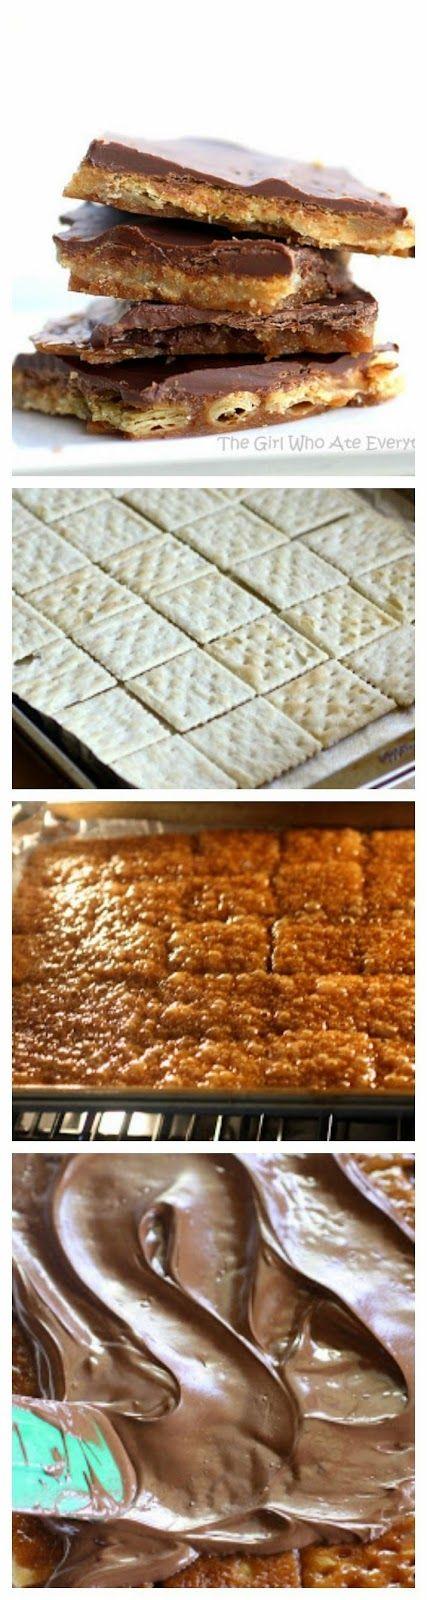 Everything Everywhere: Saltine Cracker Toffee